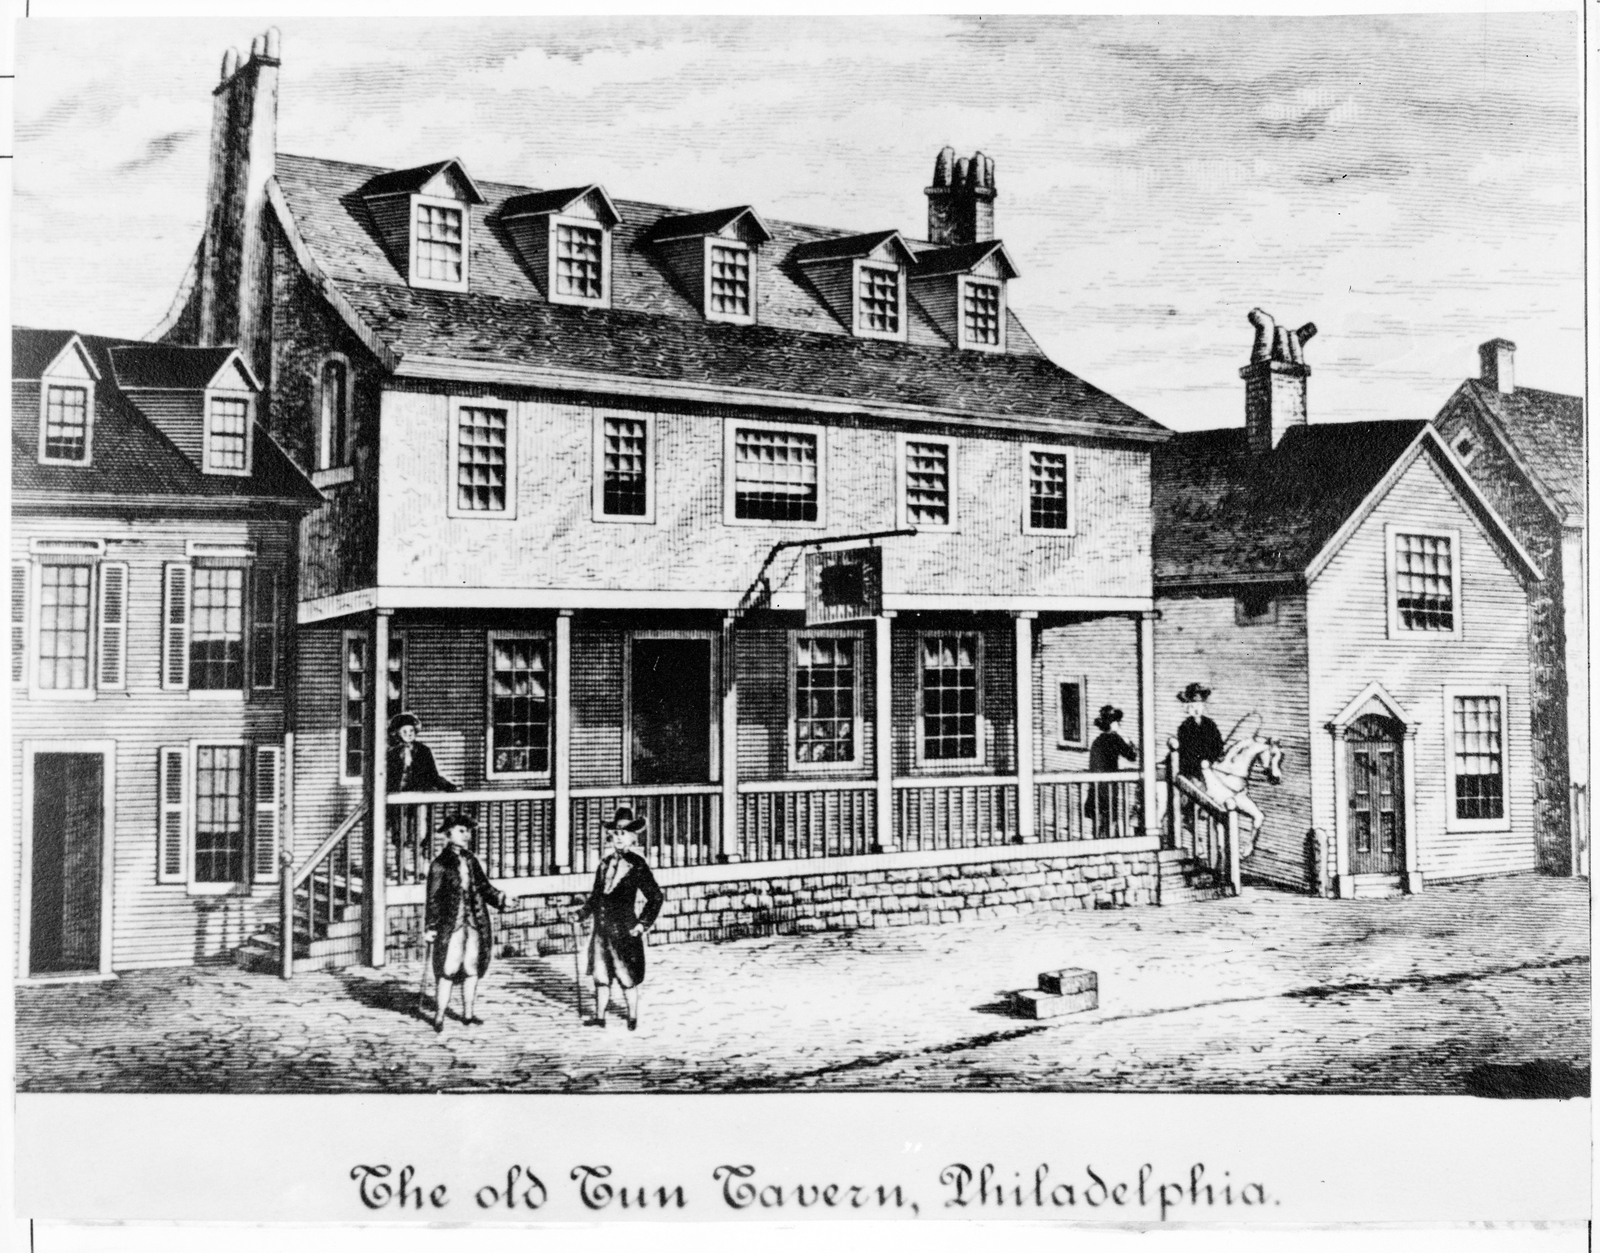 The Old Tun Tavern, Philadelphia